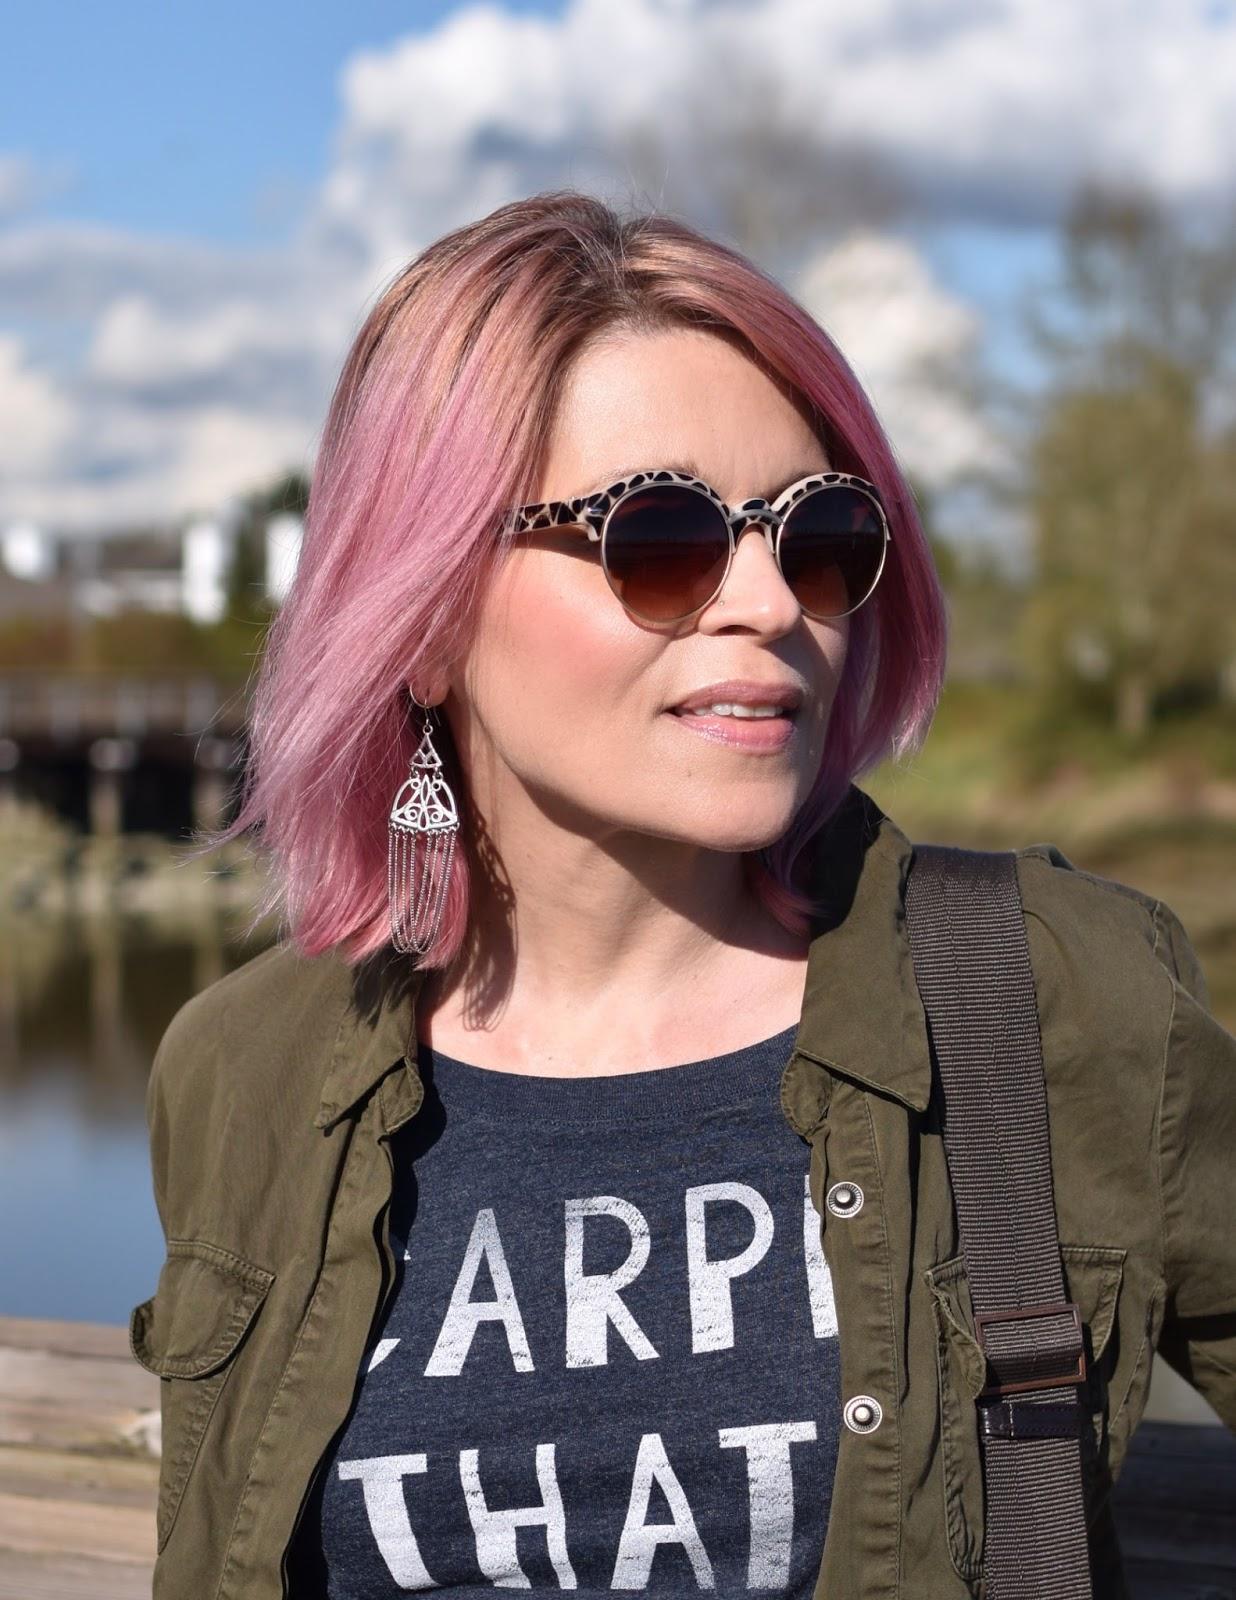 Monika Faulkner outfit inspiration - graphic tee, olive bomber jacket, Nanette sunglasses, pink hair